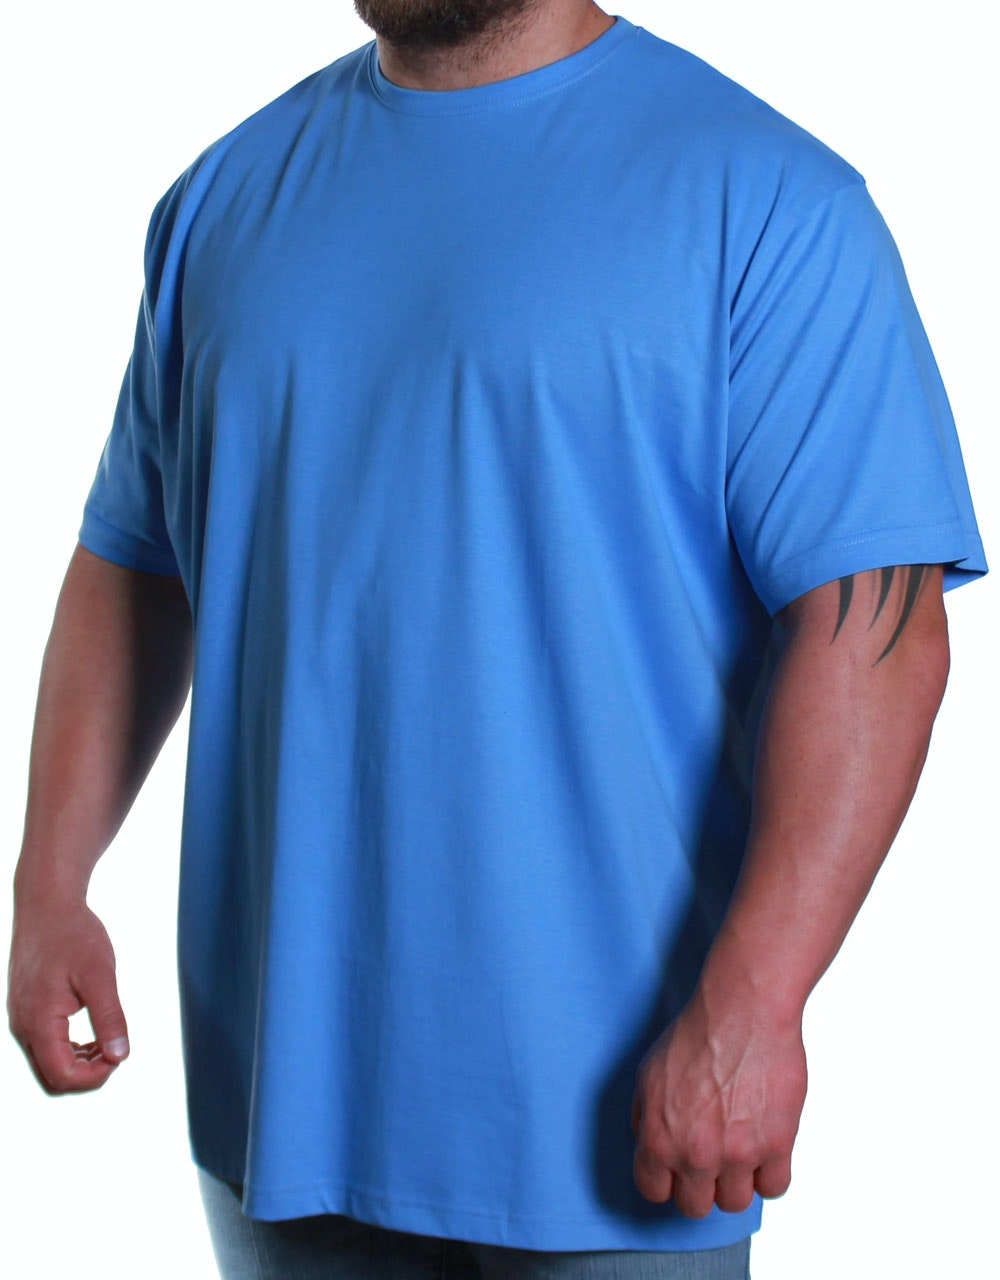 Espionage Crew Neck T-Shirt Blue